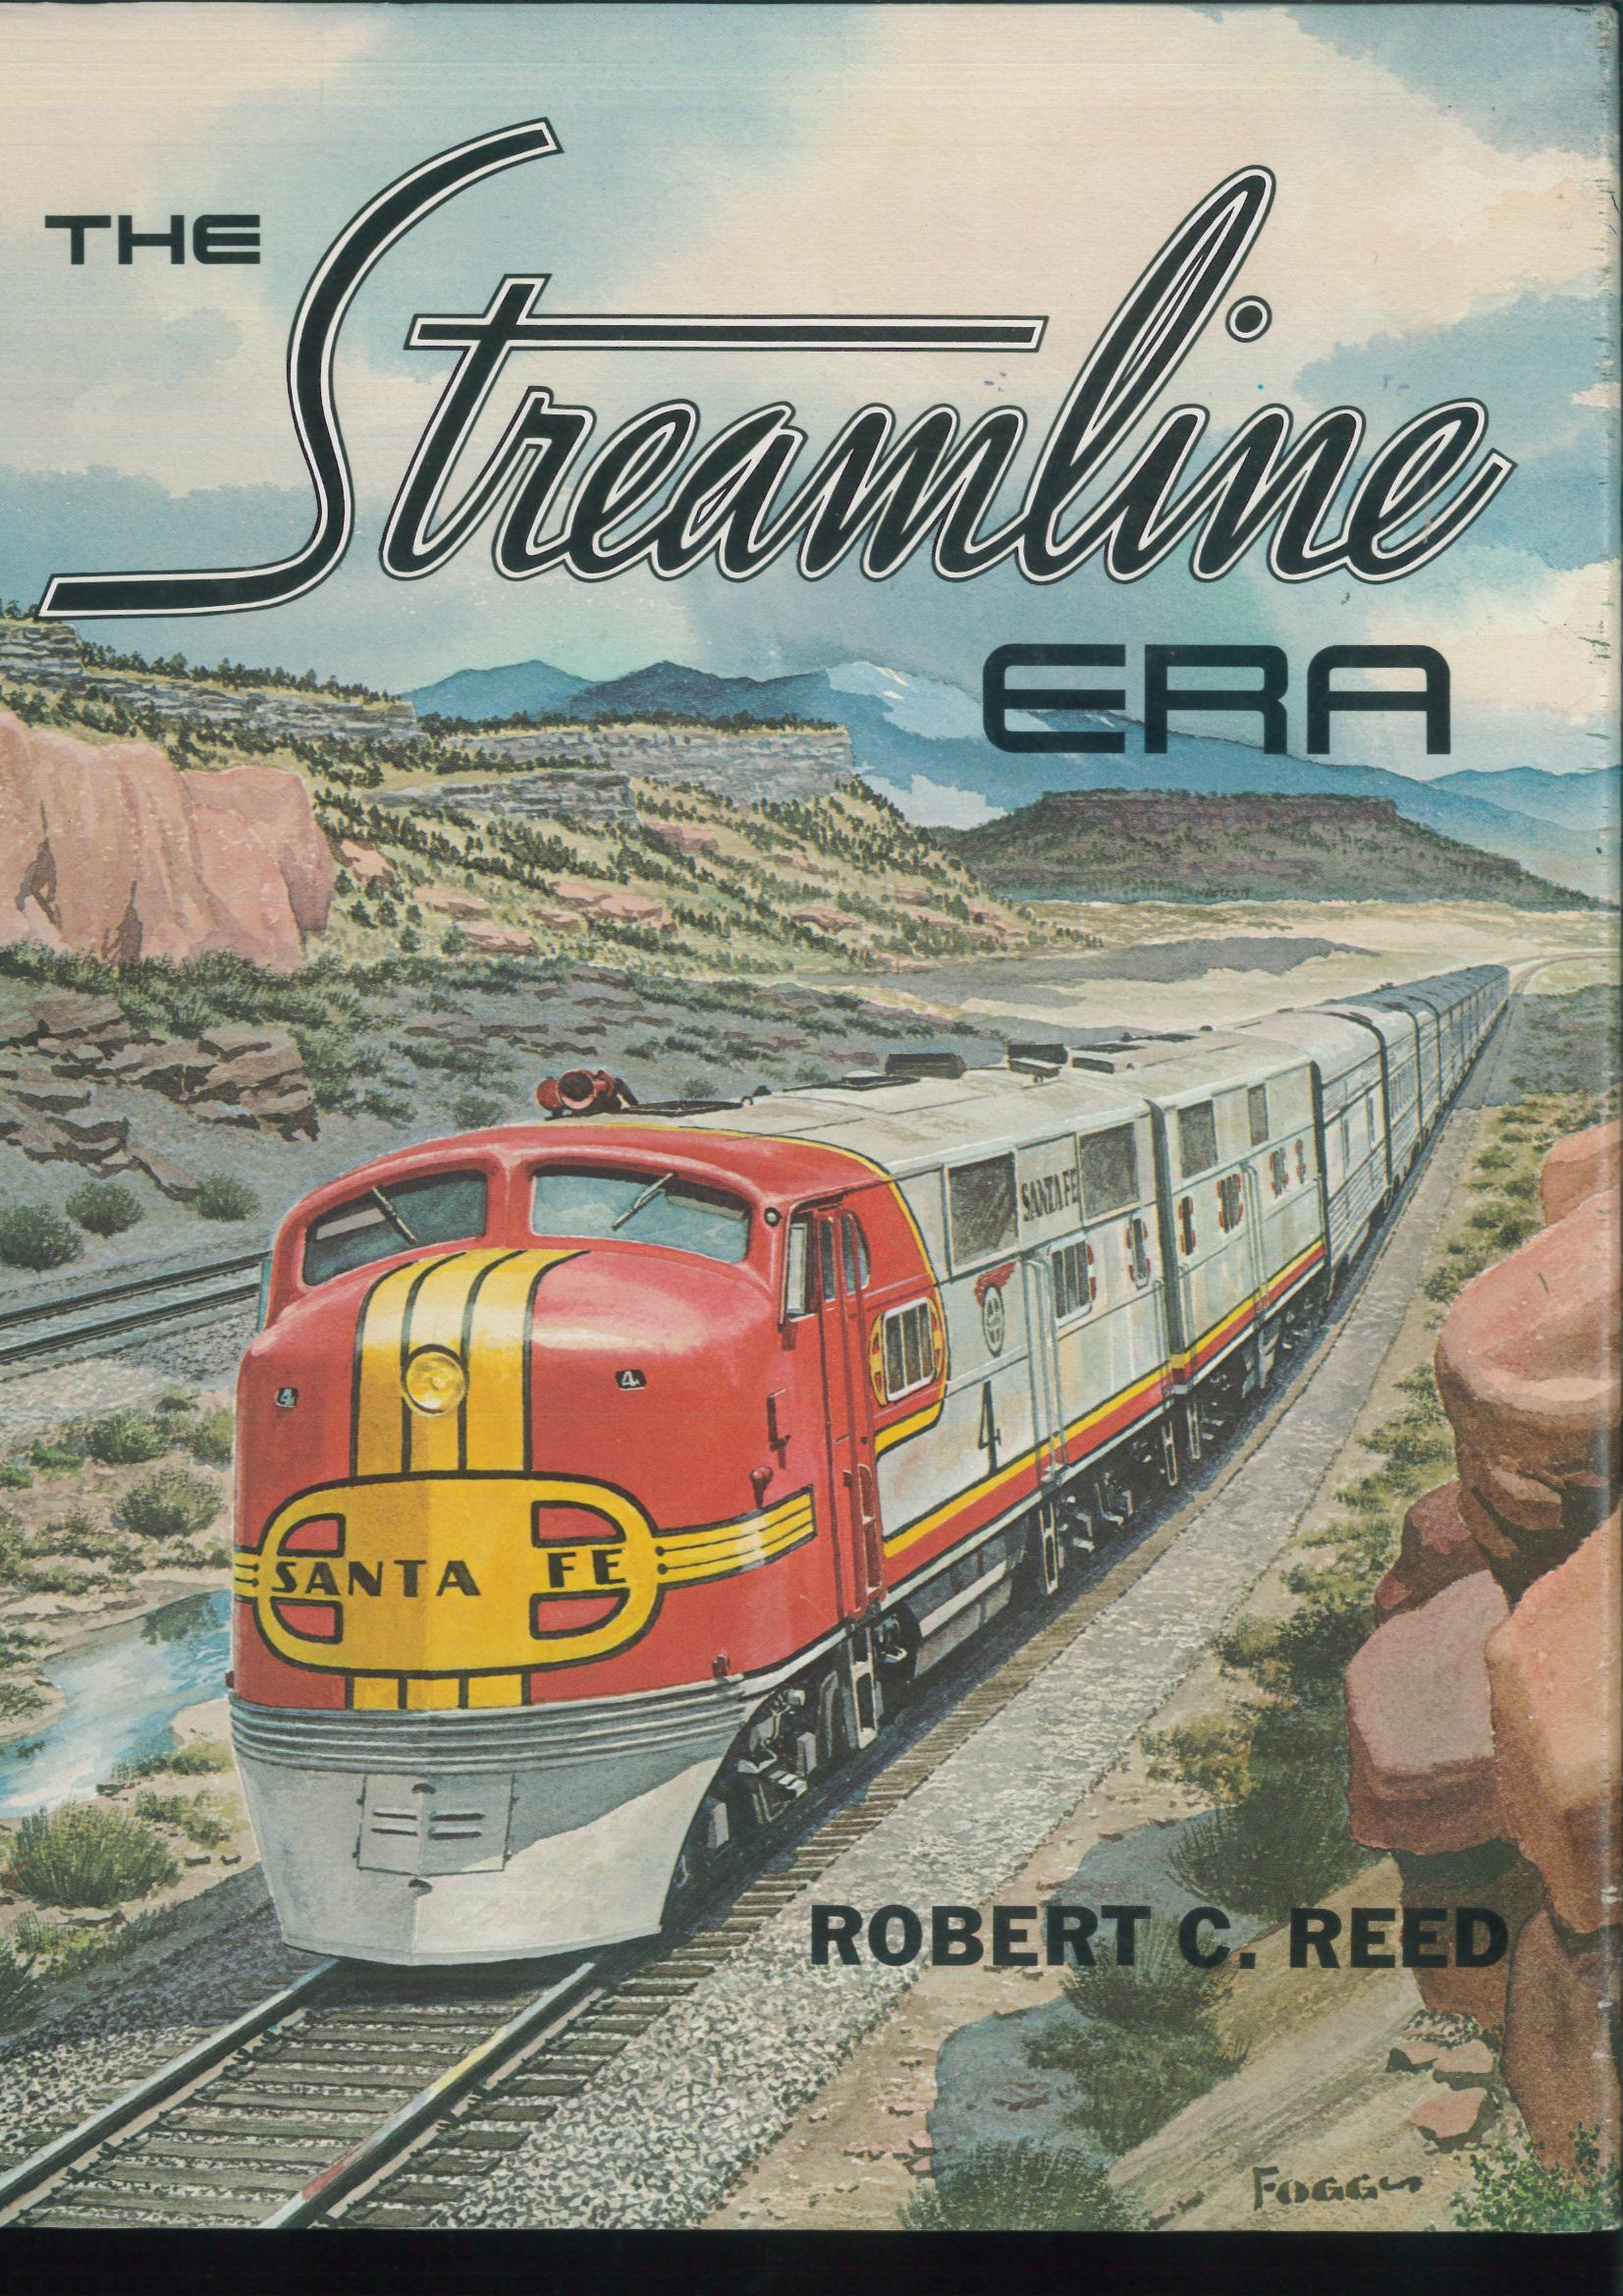 The Streamline Era  - Robert C. Reed | günstig bestellen bei Modelleisenbahn Center  MCS Vertriebs GmbH